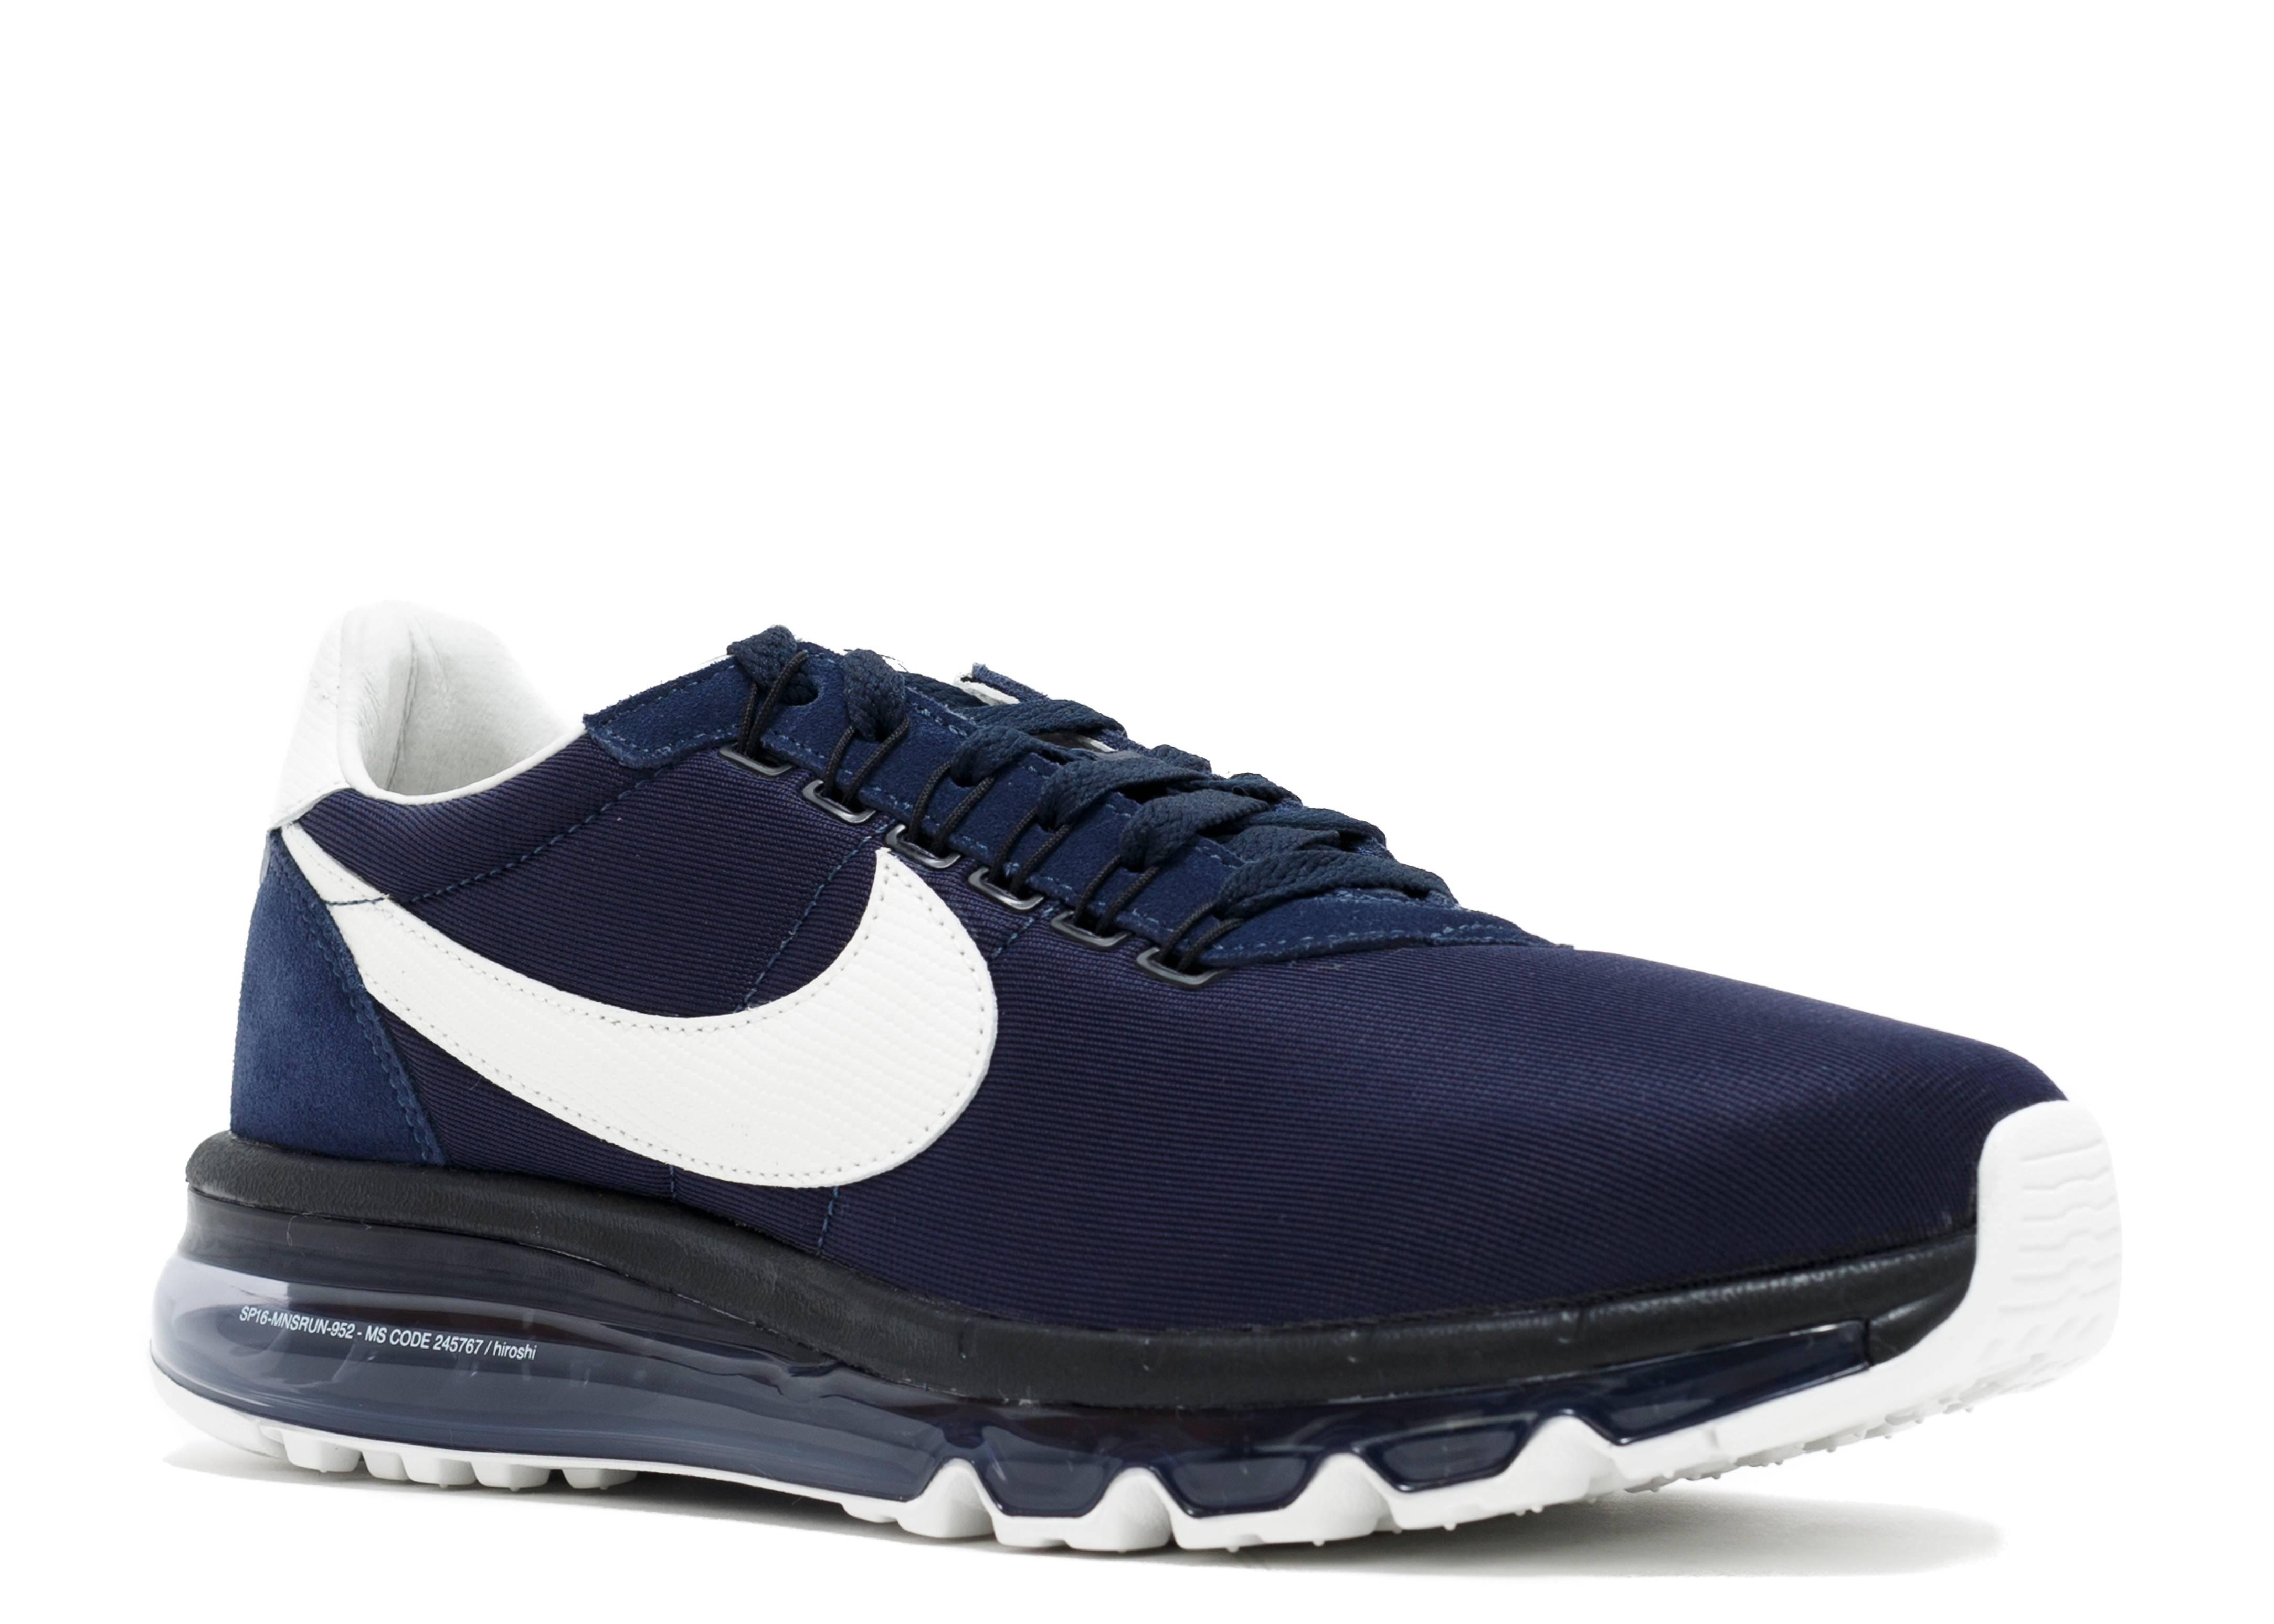 blue grey womens nike air max ld zero shoes. Black Bedroom Furniture Sets. Home Design Ideas